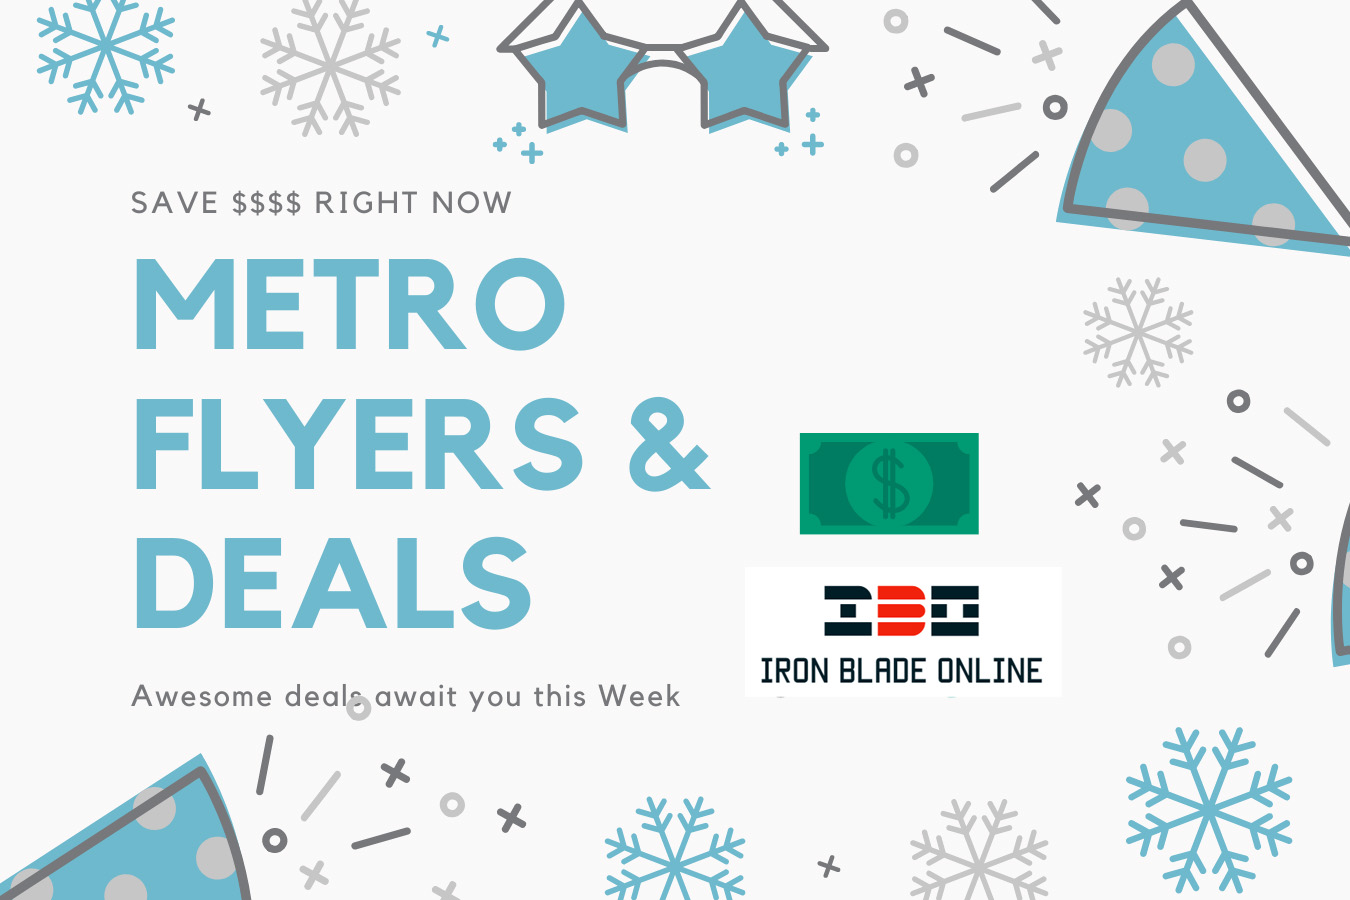 Metro Flyers (Ontario, Quebec) January 2021 Latest Deals Live✔️